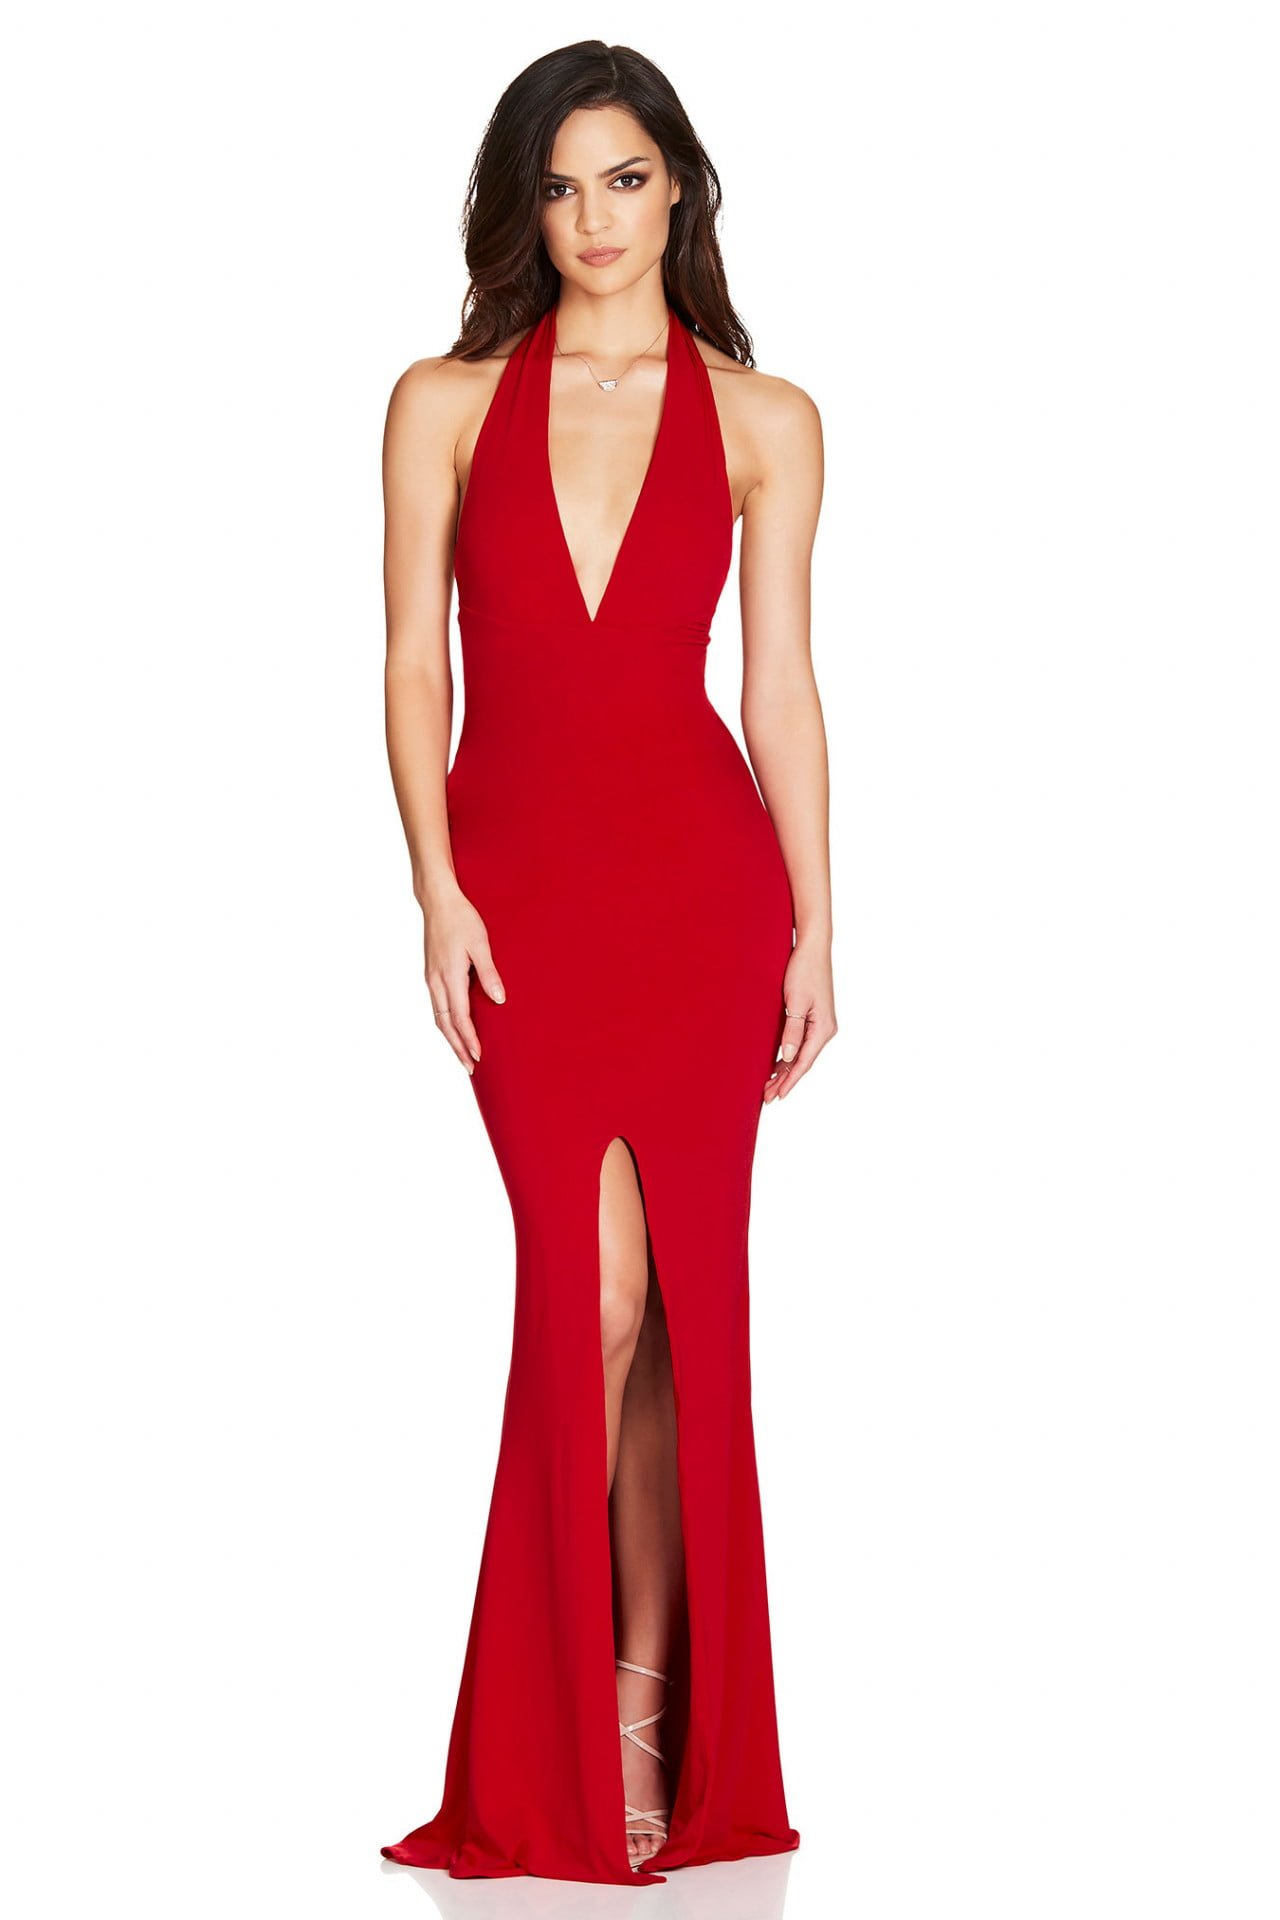 Nookie Illegal Halter Gown Backless, Floor Length, V-Neck Red